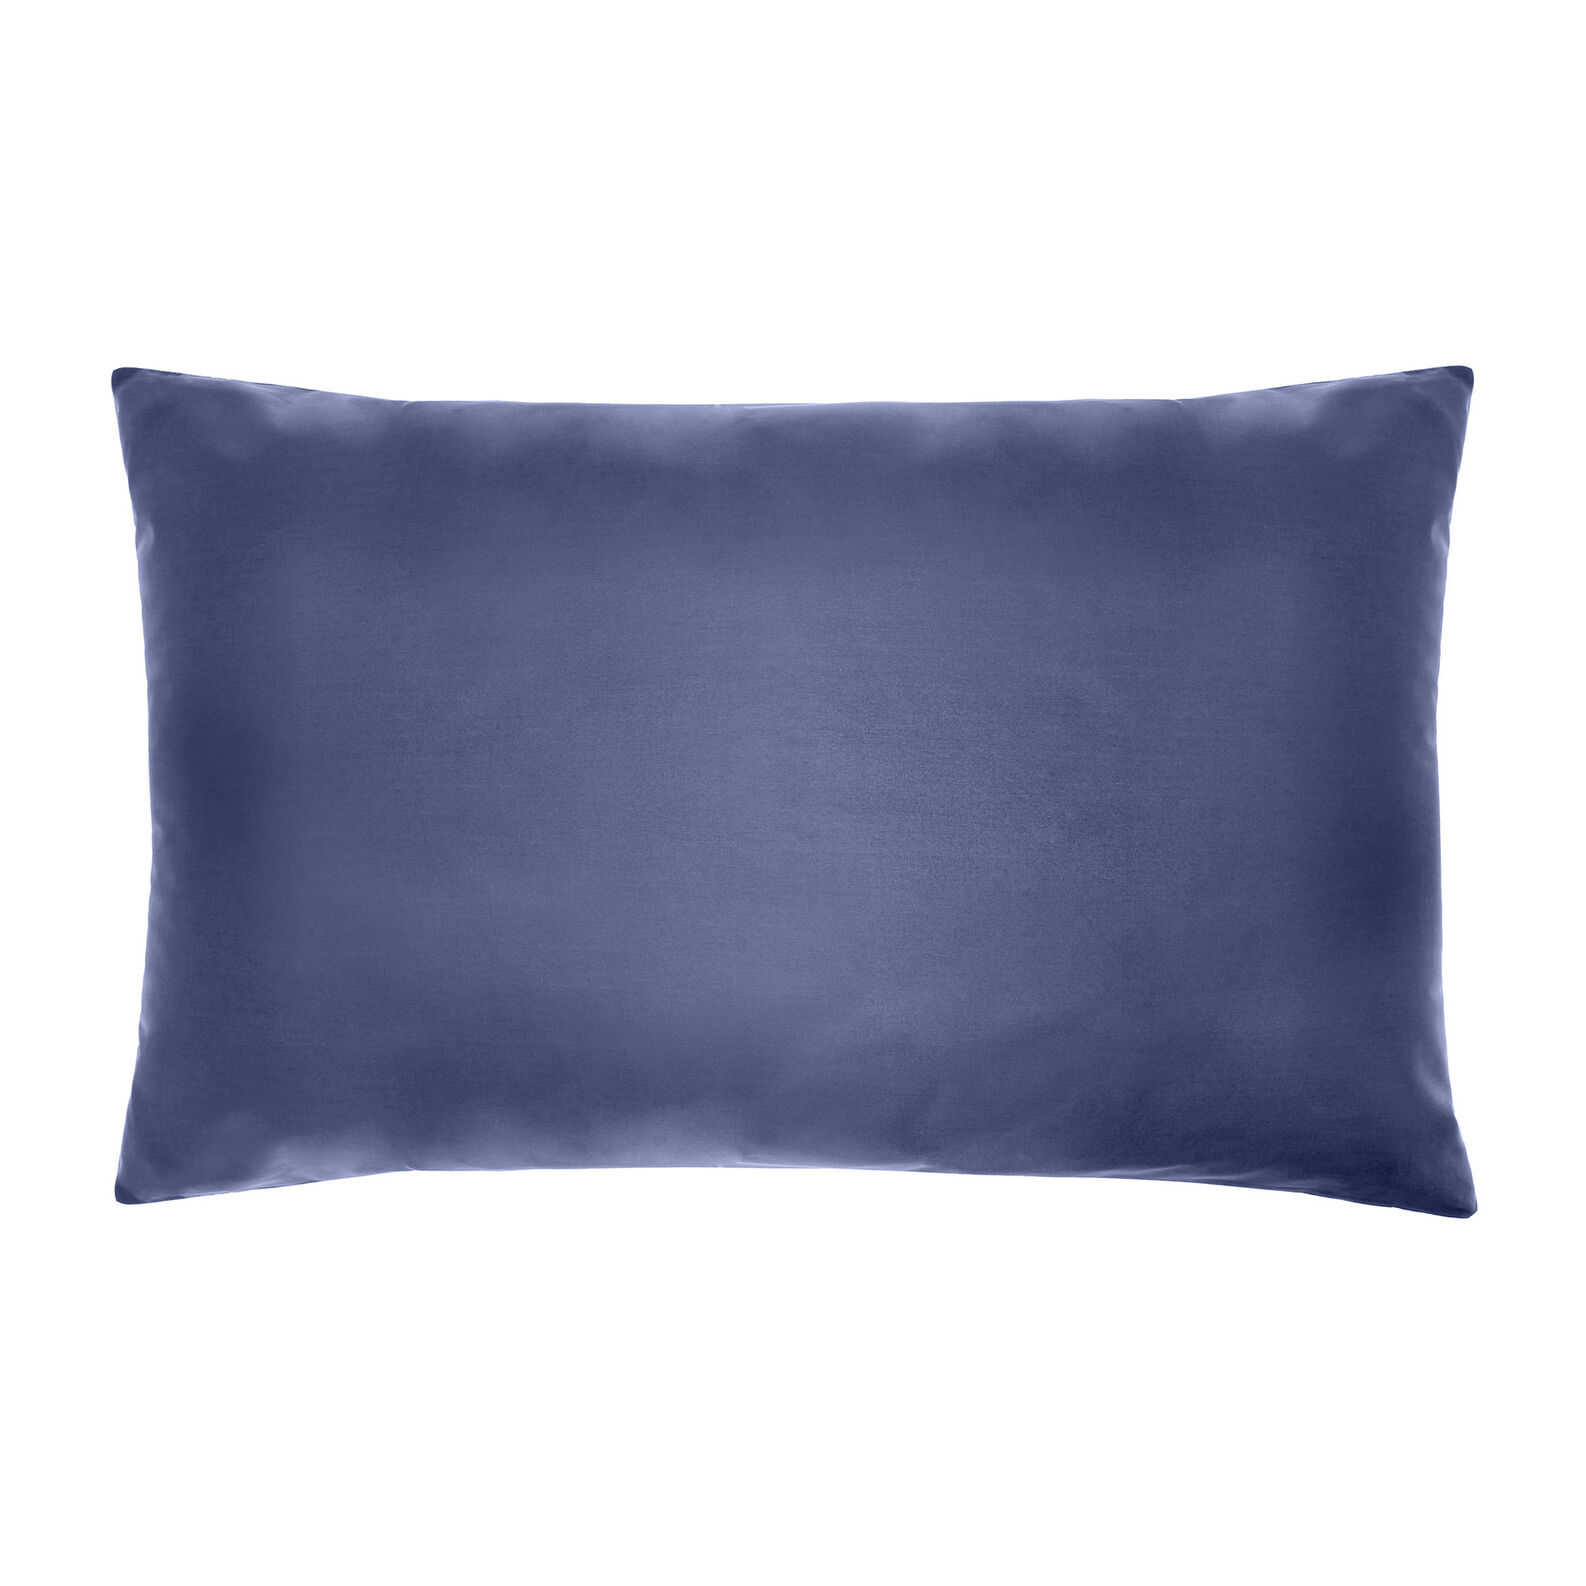 Solid colour 100% cotton pillowcase